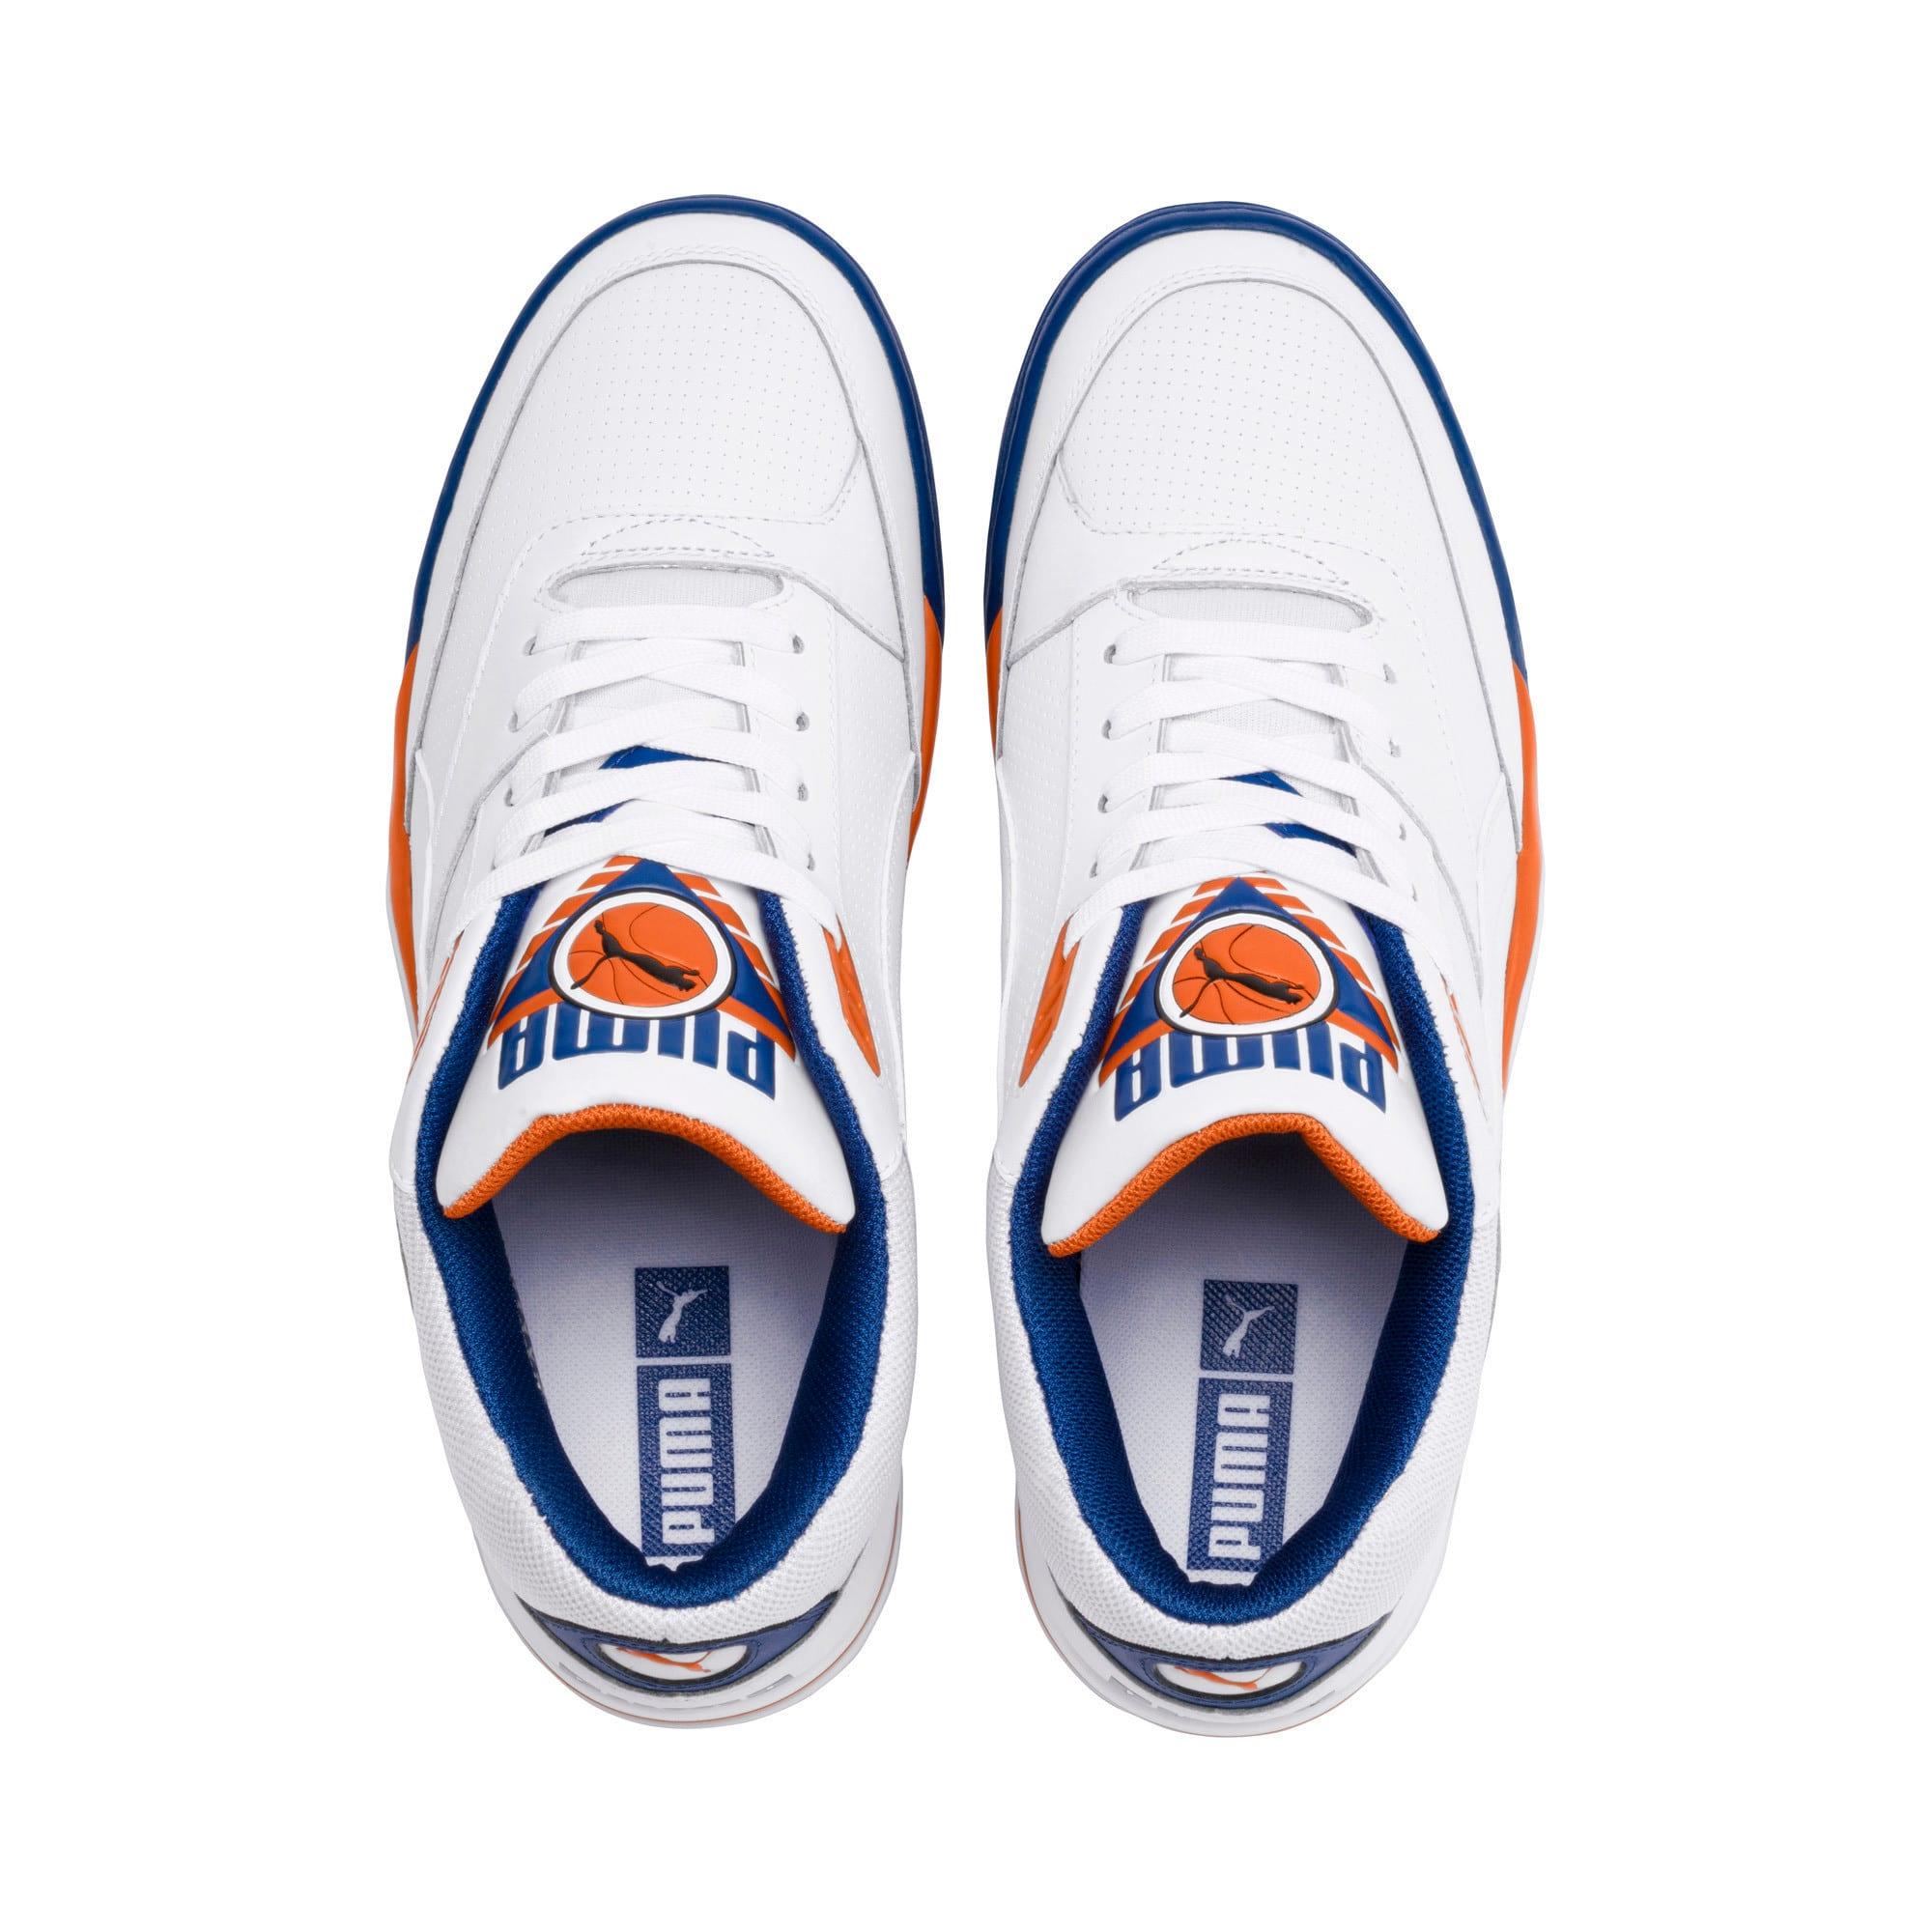 Thumbnail 6 of Palace Guard Sneakers, P White-Jaffa Orange-G Blue, medium